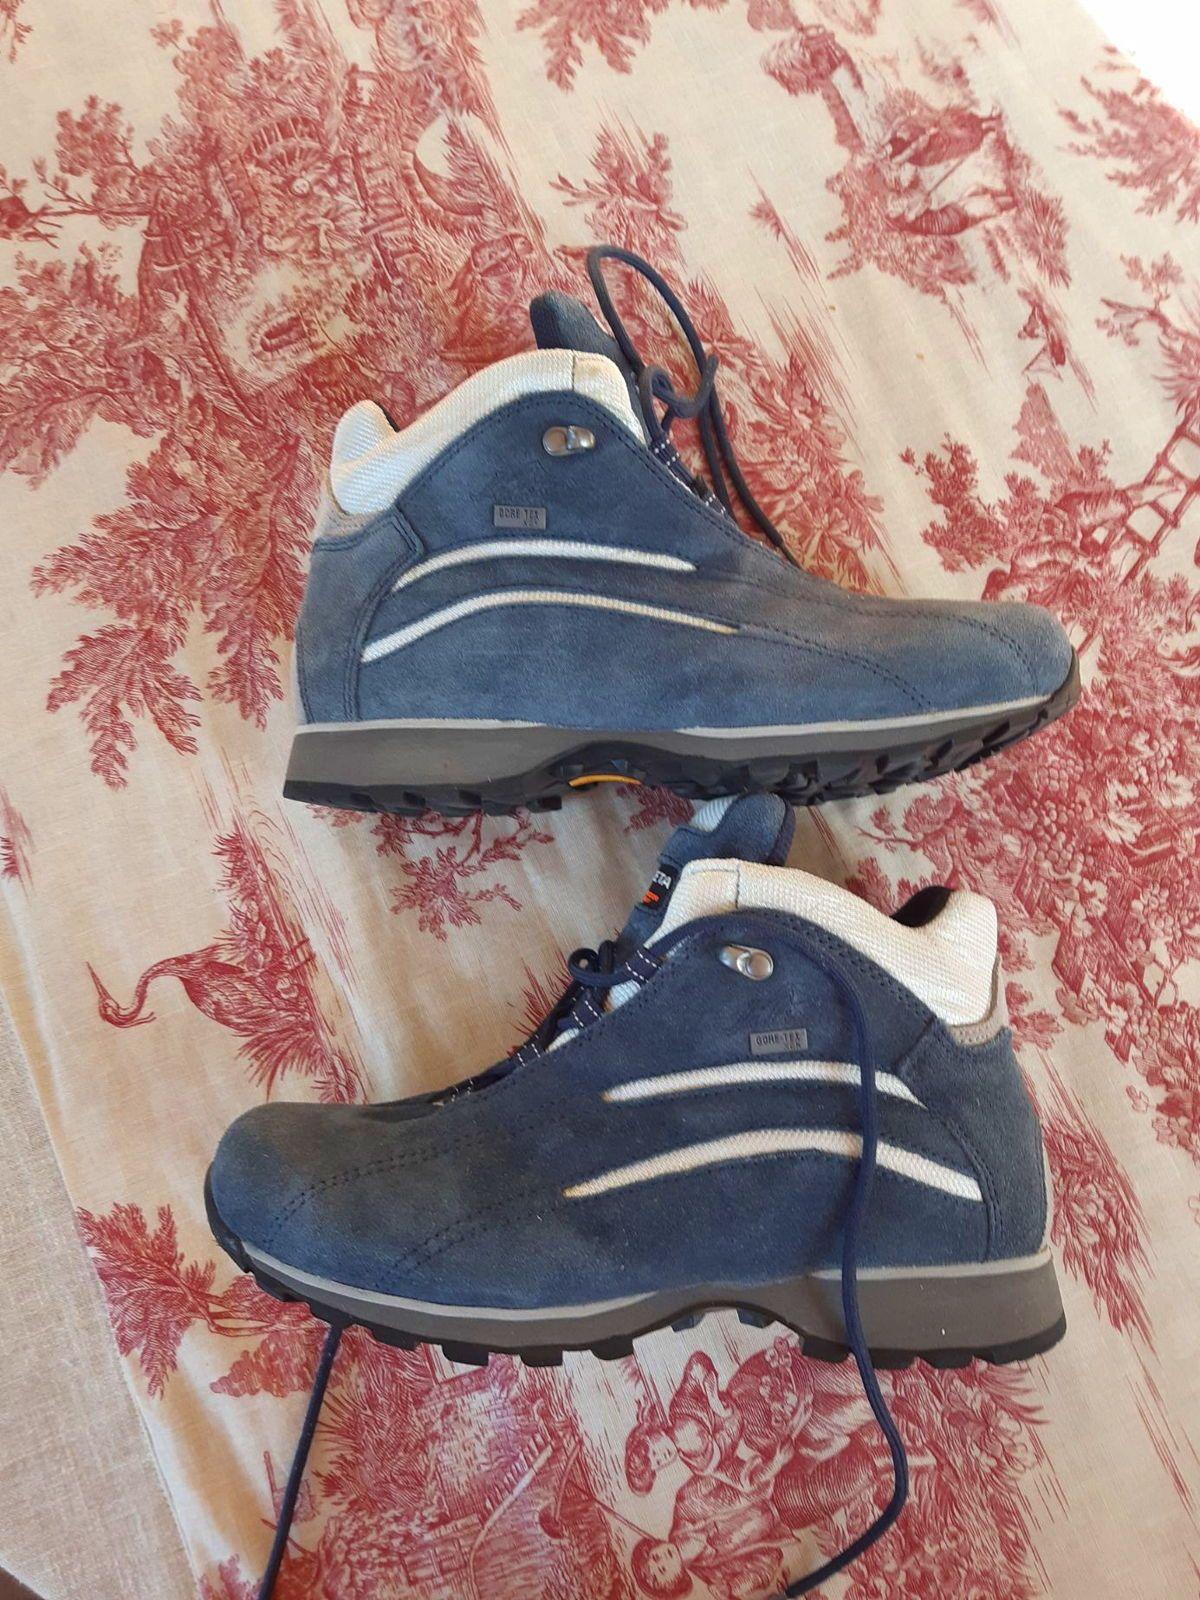 Chaussures neuves randonnée gore tex 40/41trezeta